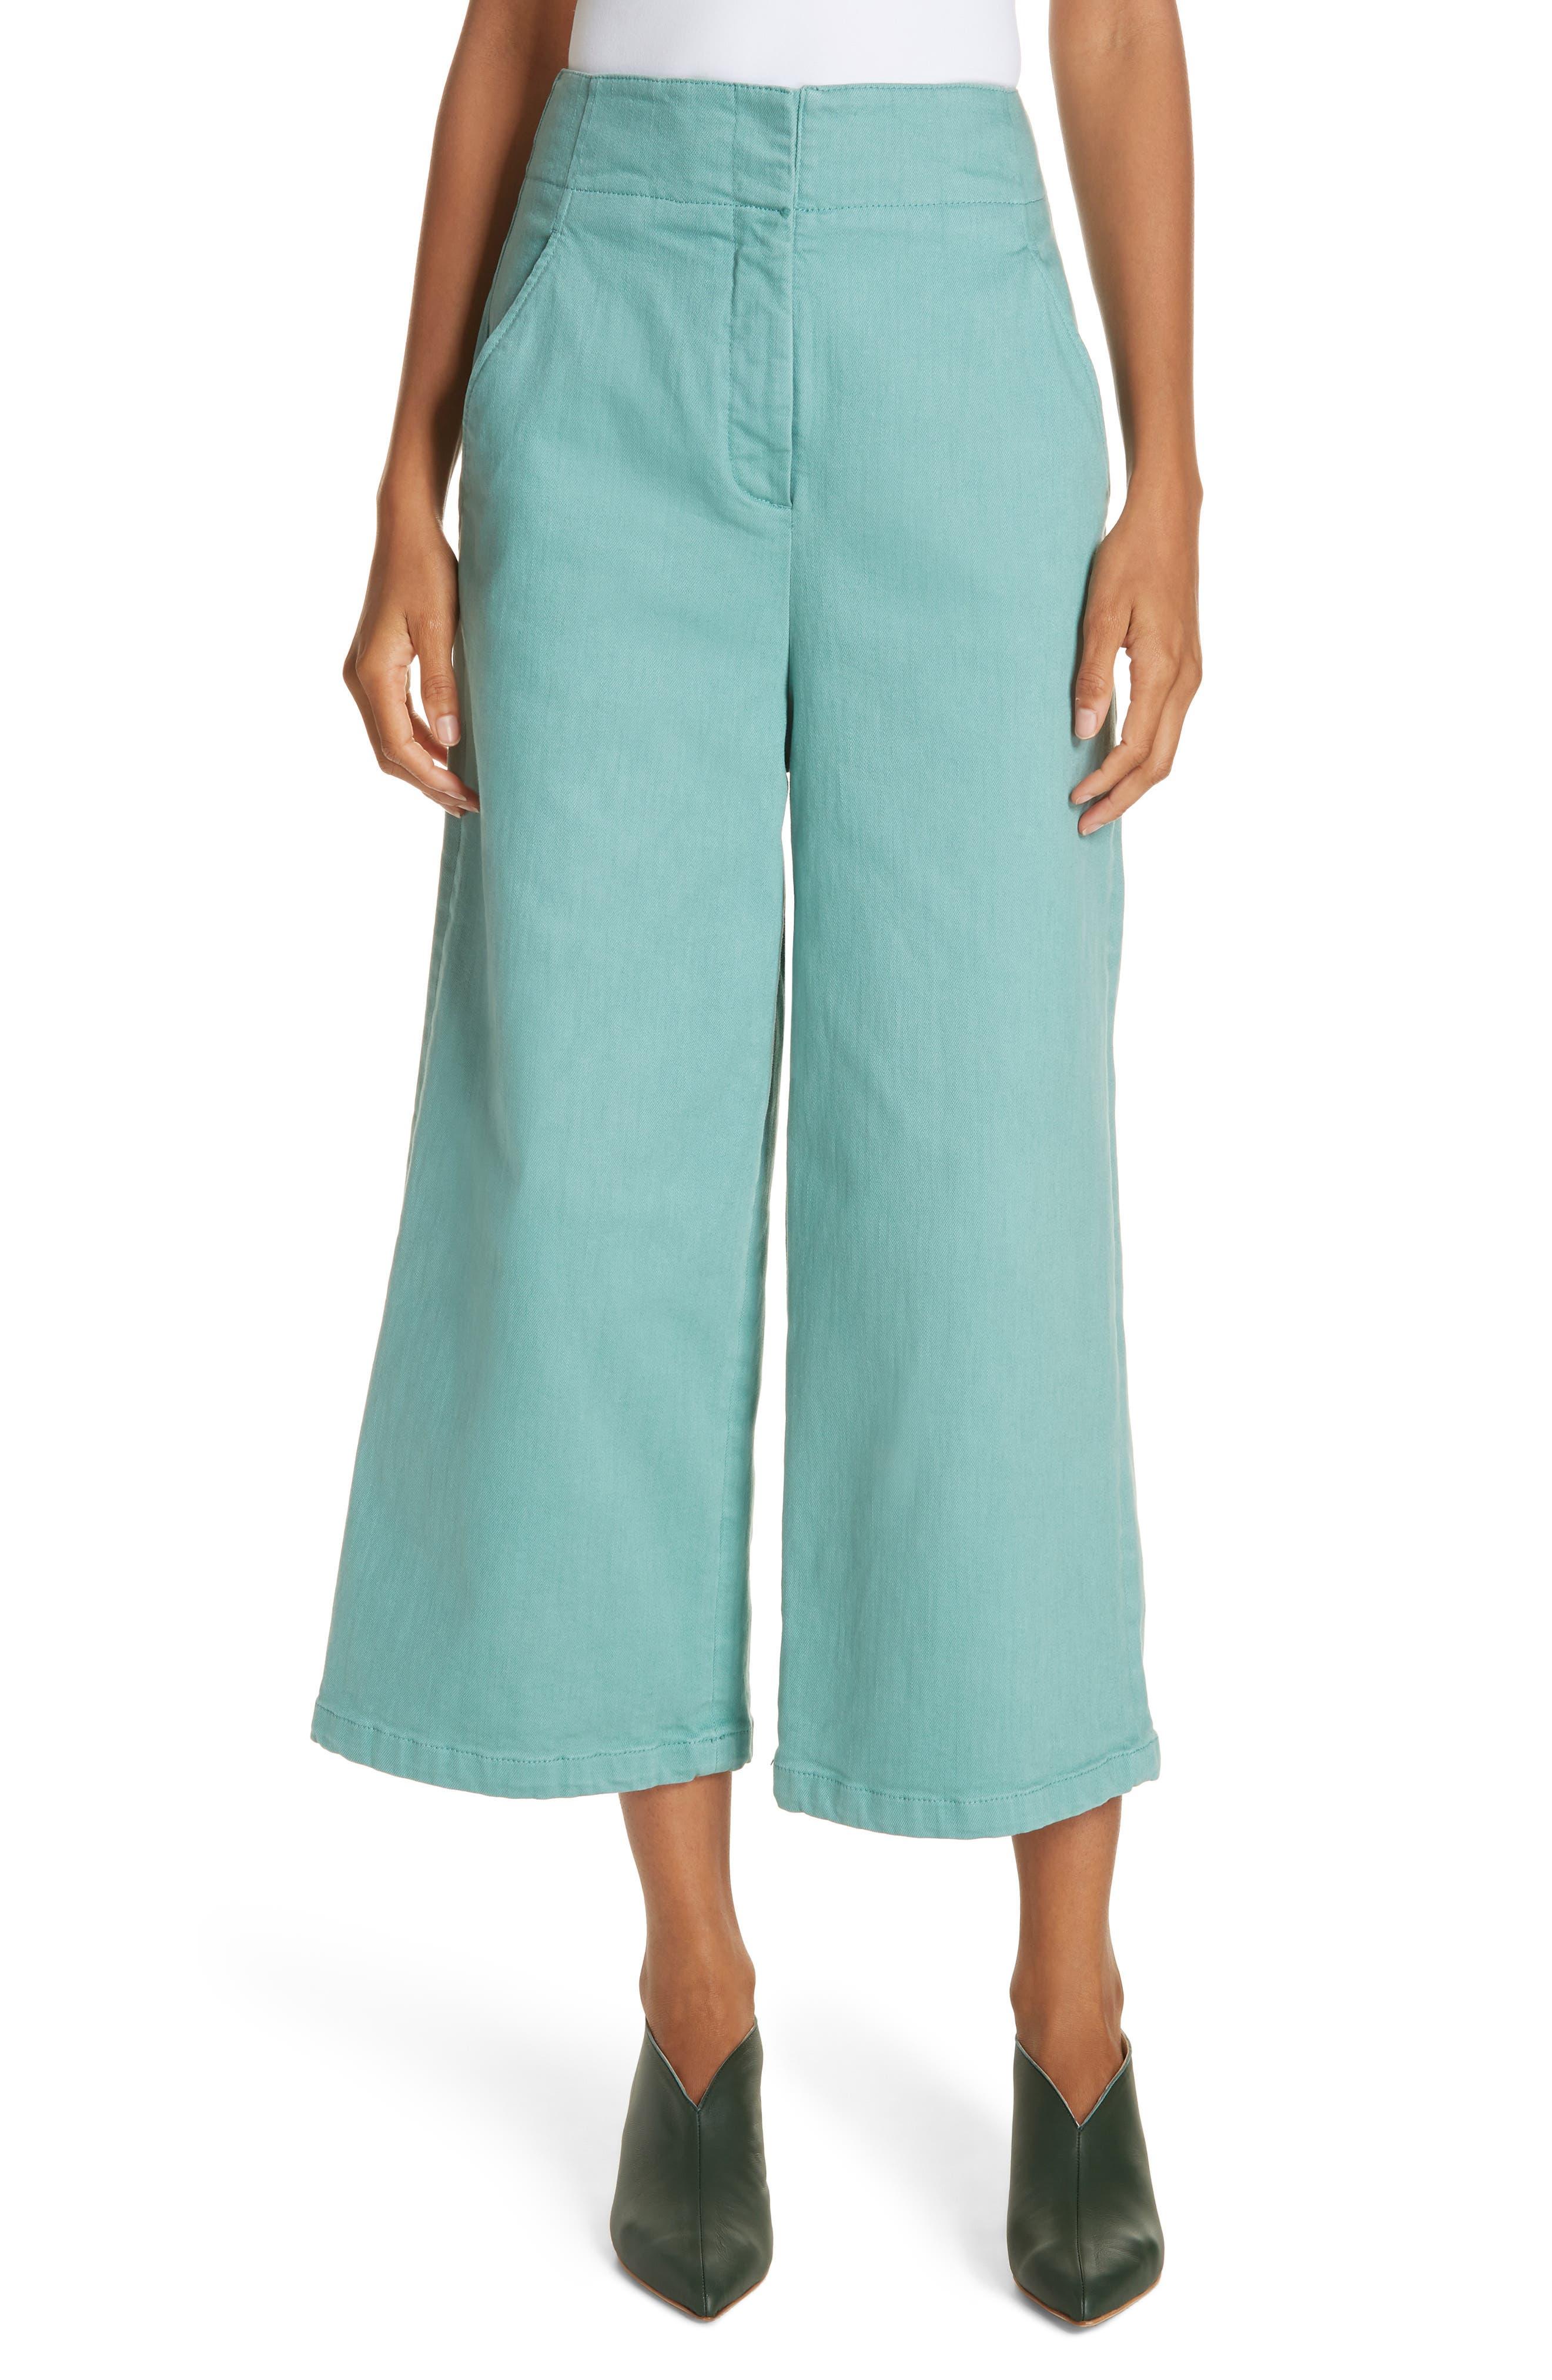 Vintage Shorts, Culottes,  Capris History Womens Tibi Garment Dyed Wide Leg Crop Jeans $157.98 AT vintagedancer.com